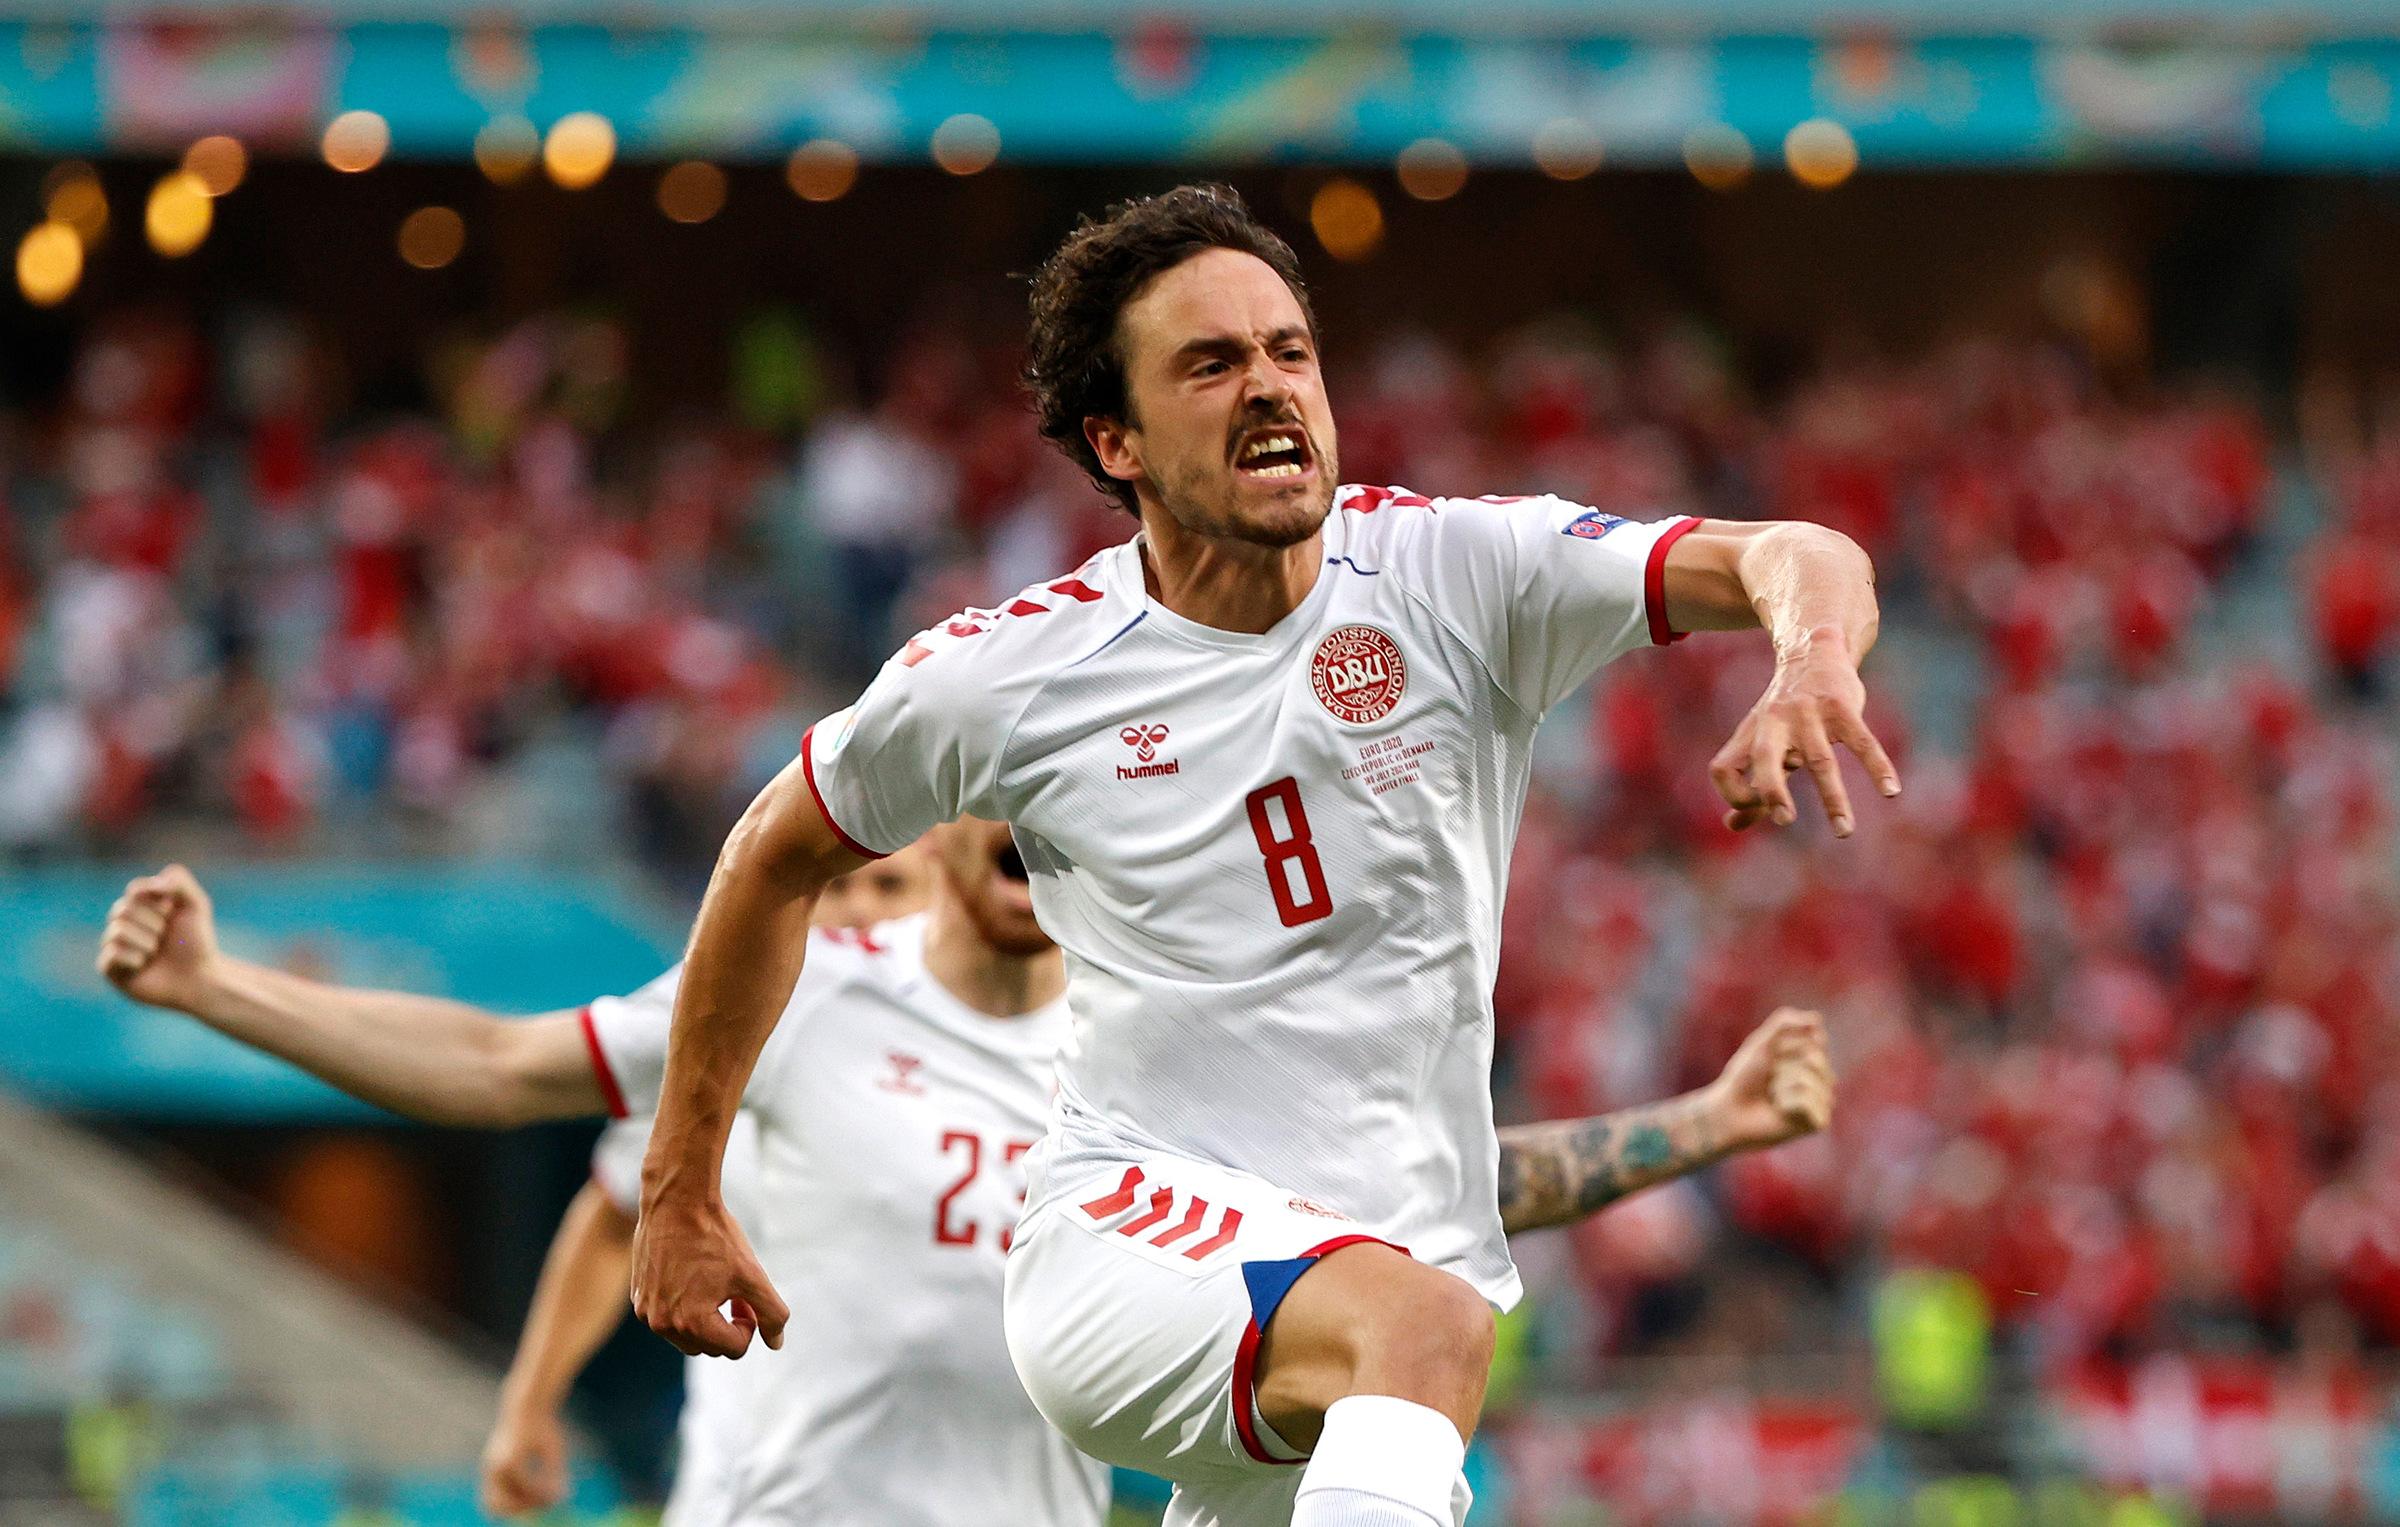 Delaney memainkan 59 pertandingan, mencetak enam gol untuk Denmark pada akhir perempat final Euro 2021 pada 3 Juli.  Foto: Reuters